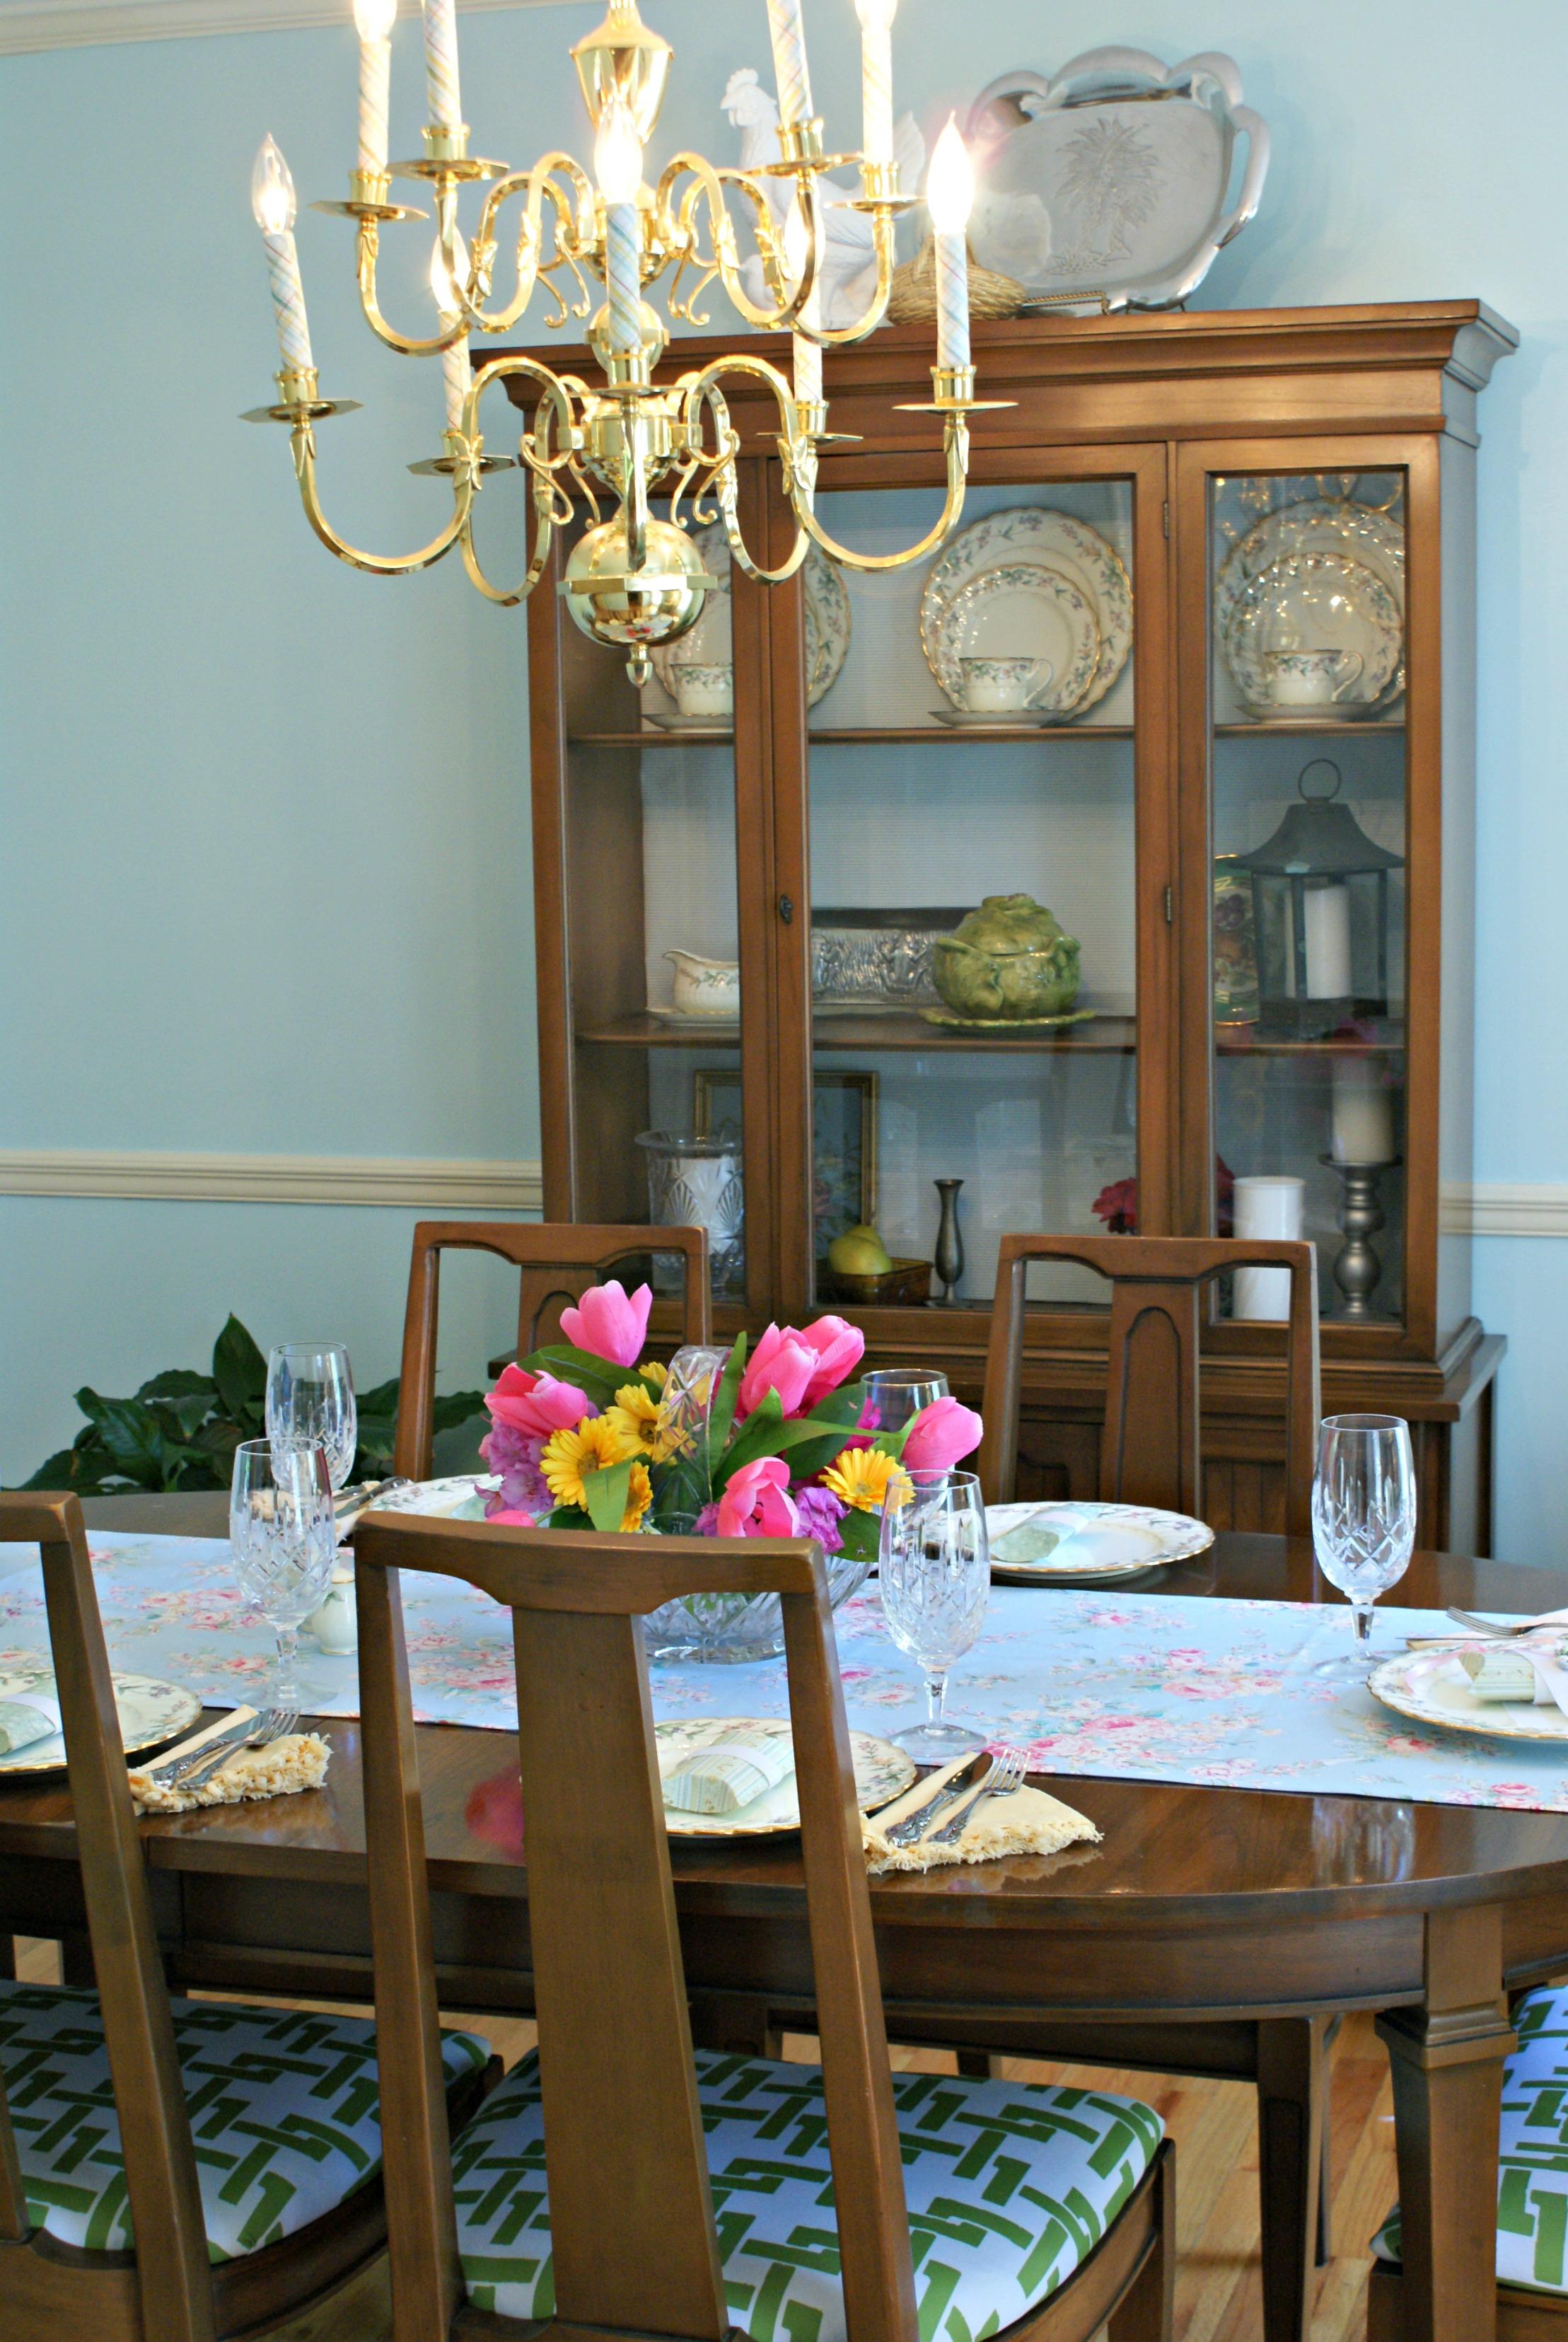 a dining room makeover on a budget 3 little greenwoods 3littlegreenwoods